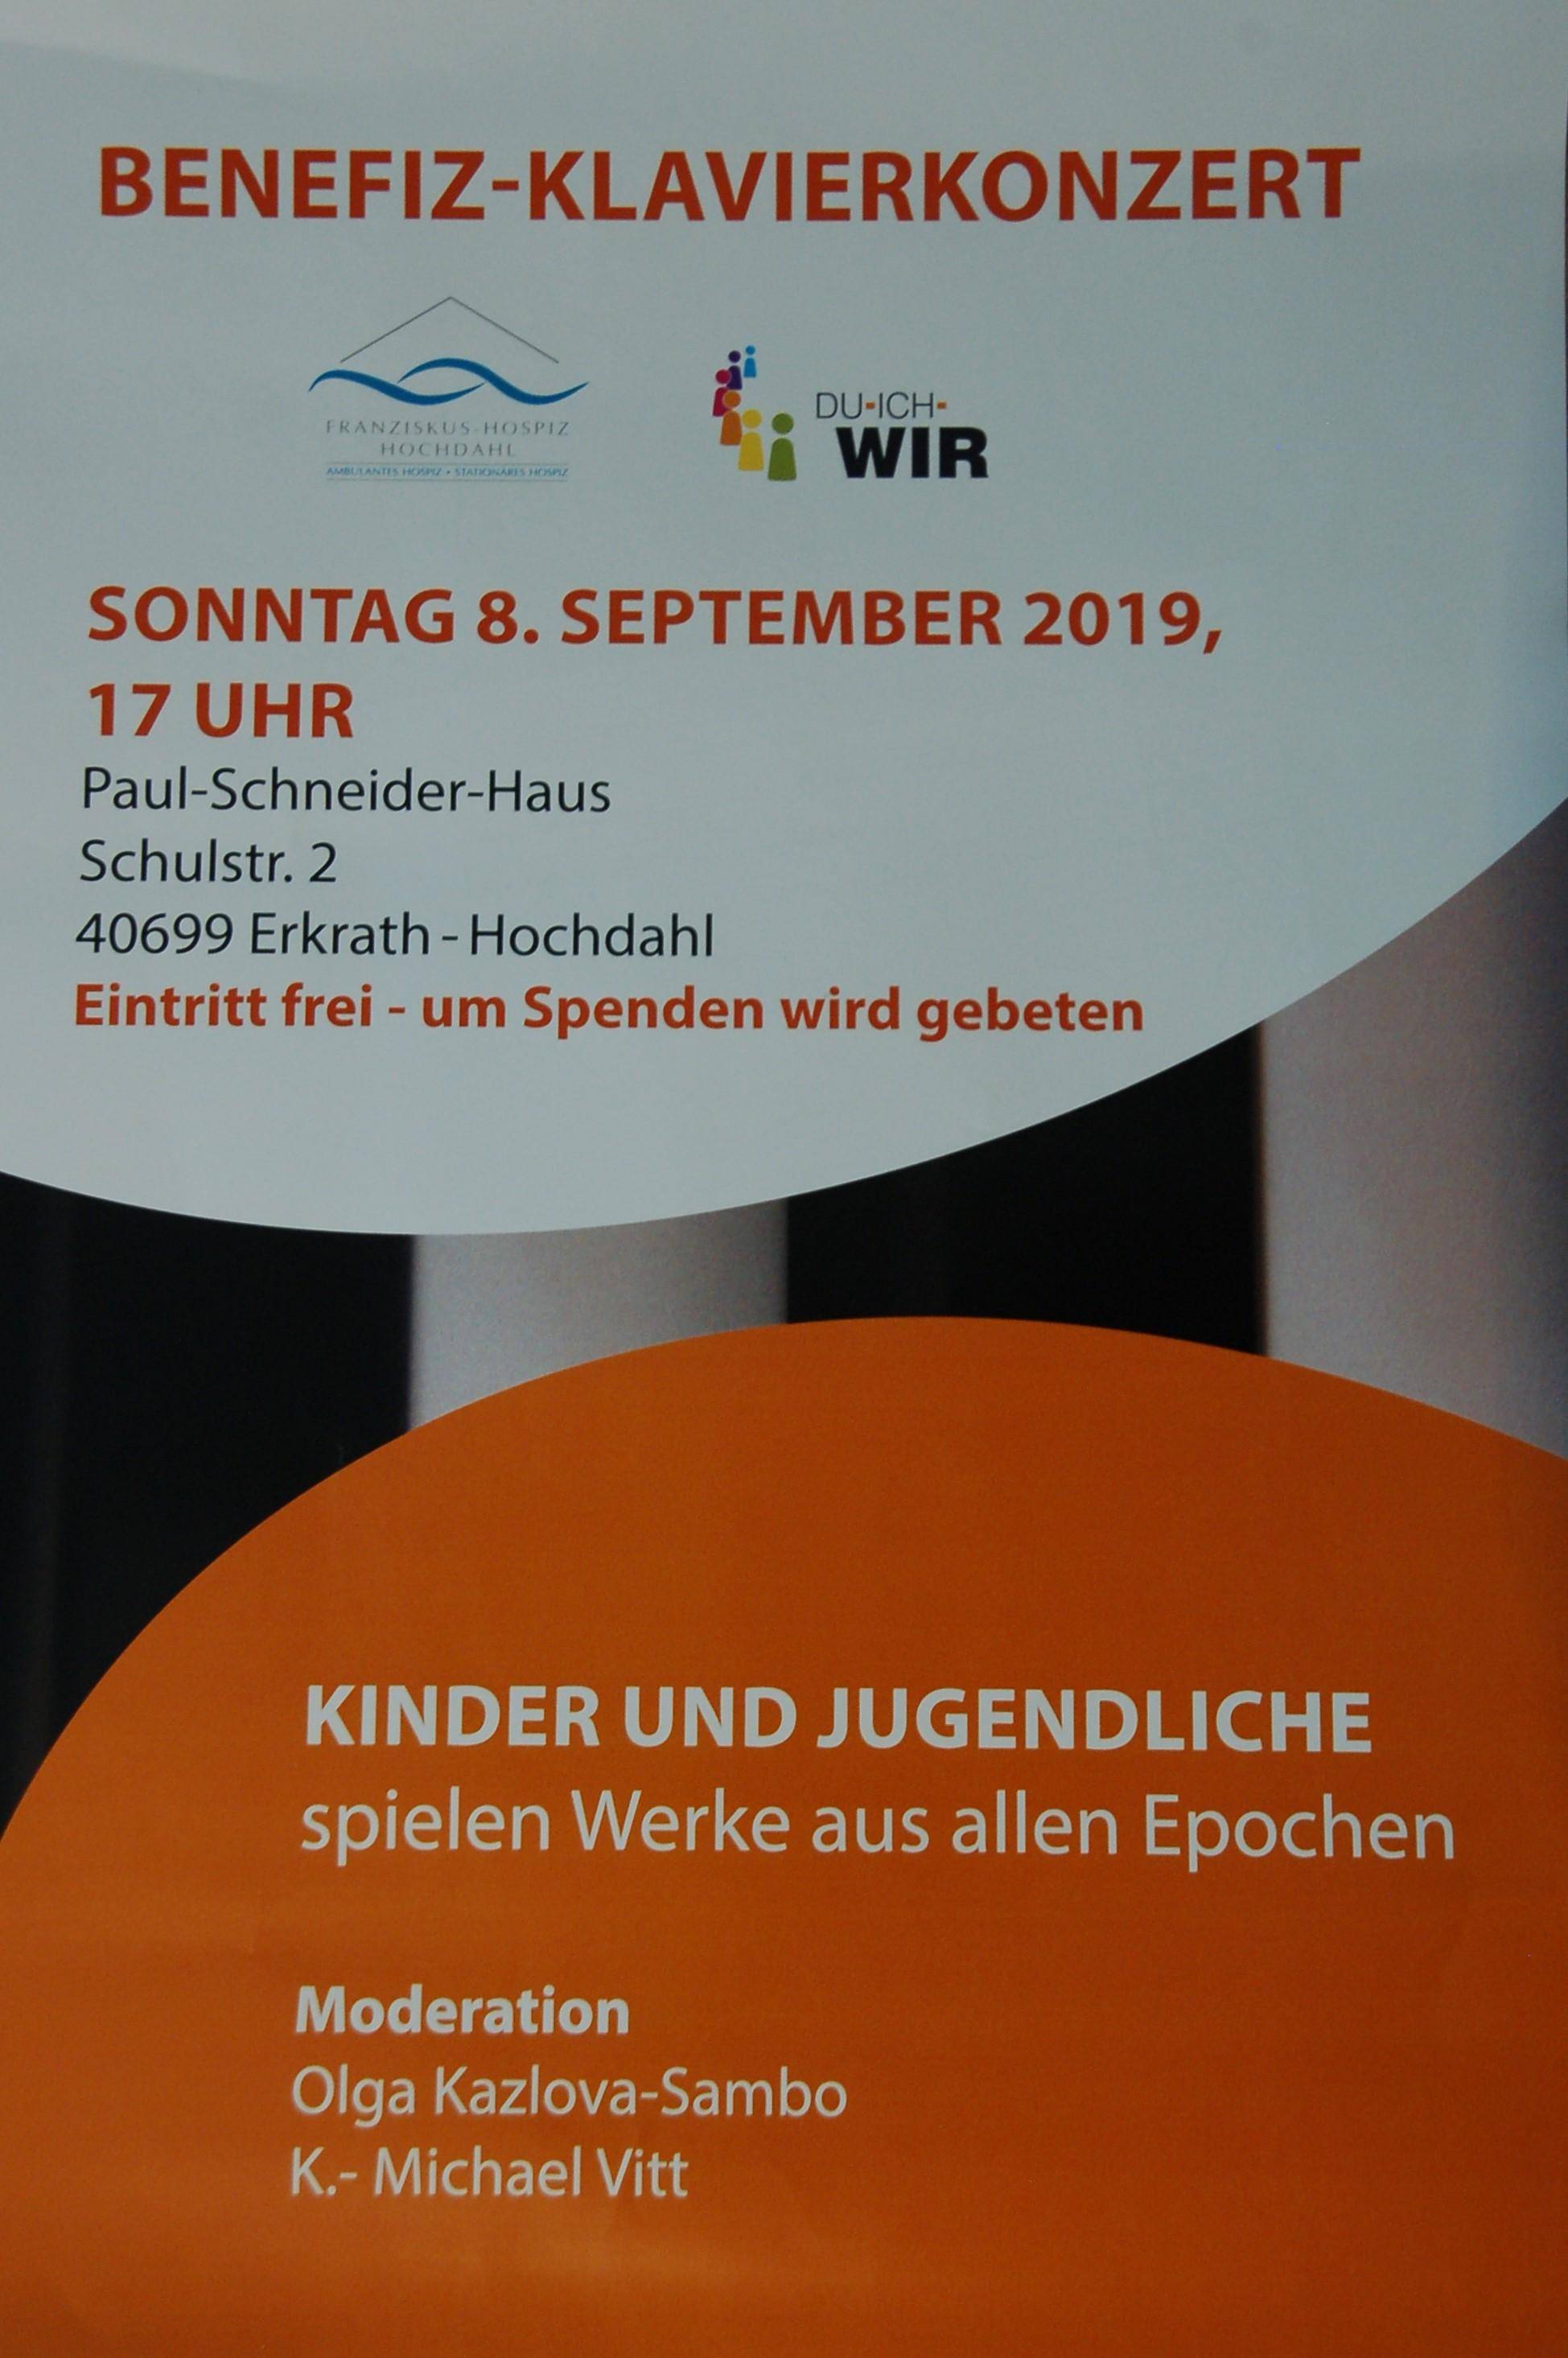 Benefiz-Klavierkonzert 2019